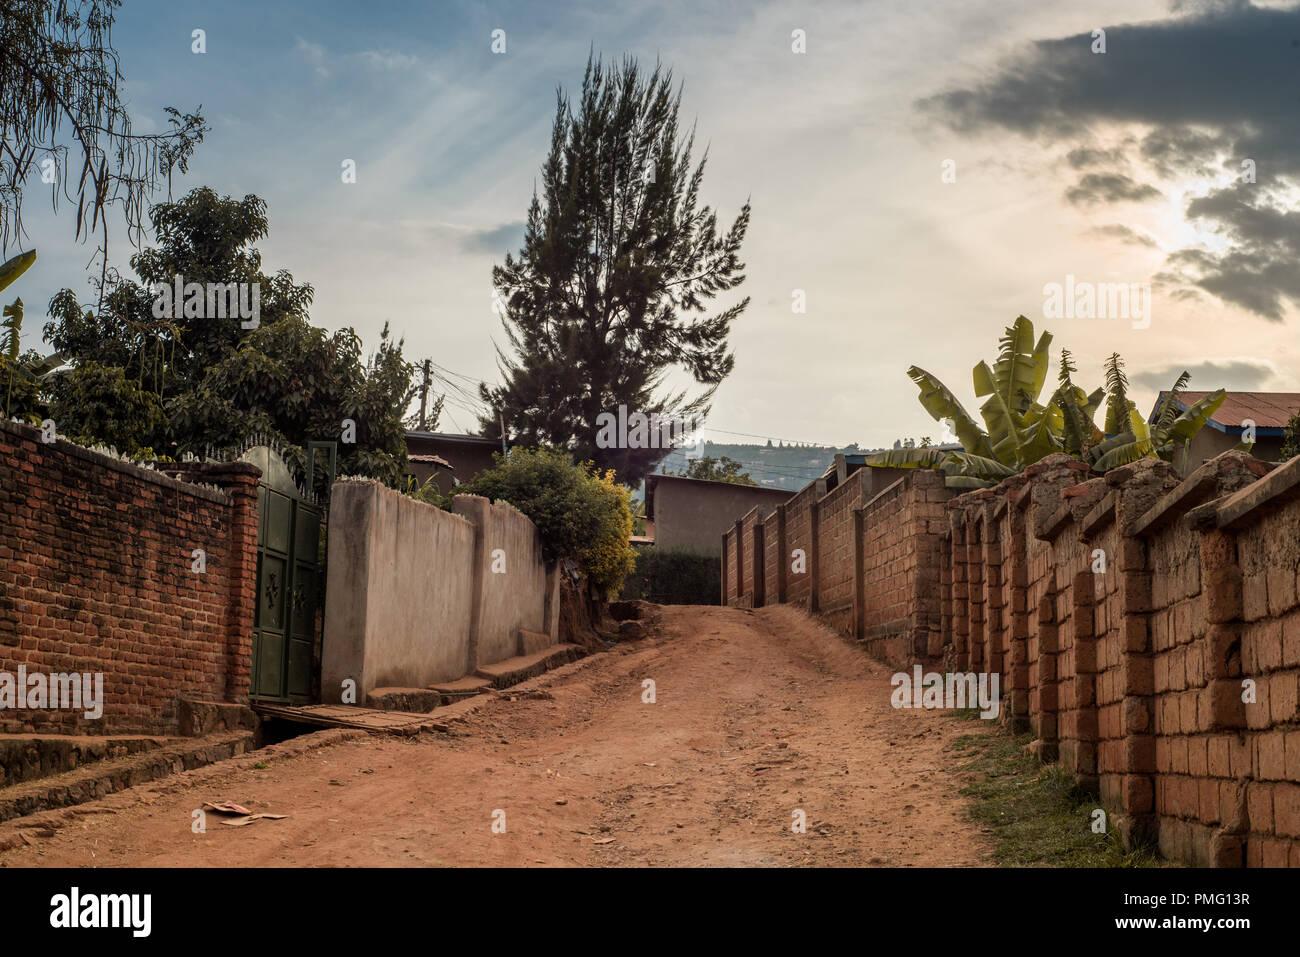 View of a dirt road between houses in Nyamirambo, an outlying suburb of Kigali, Rwanda - Stock Image